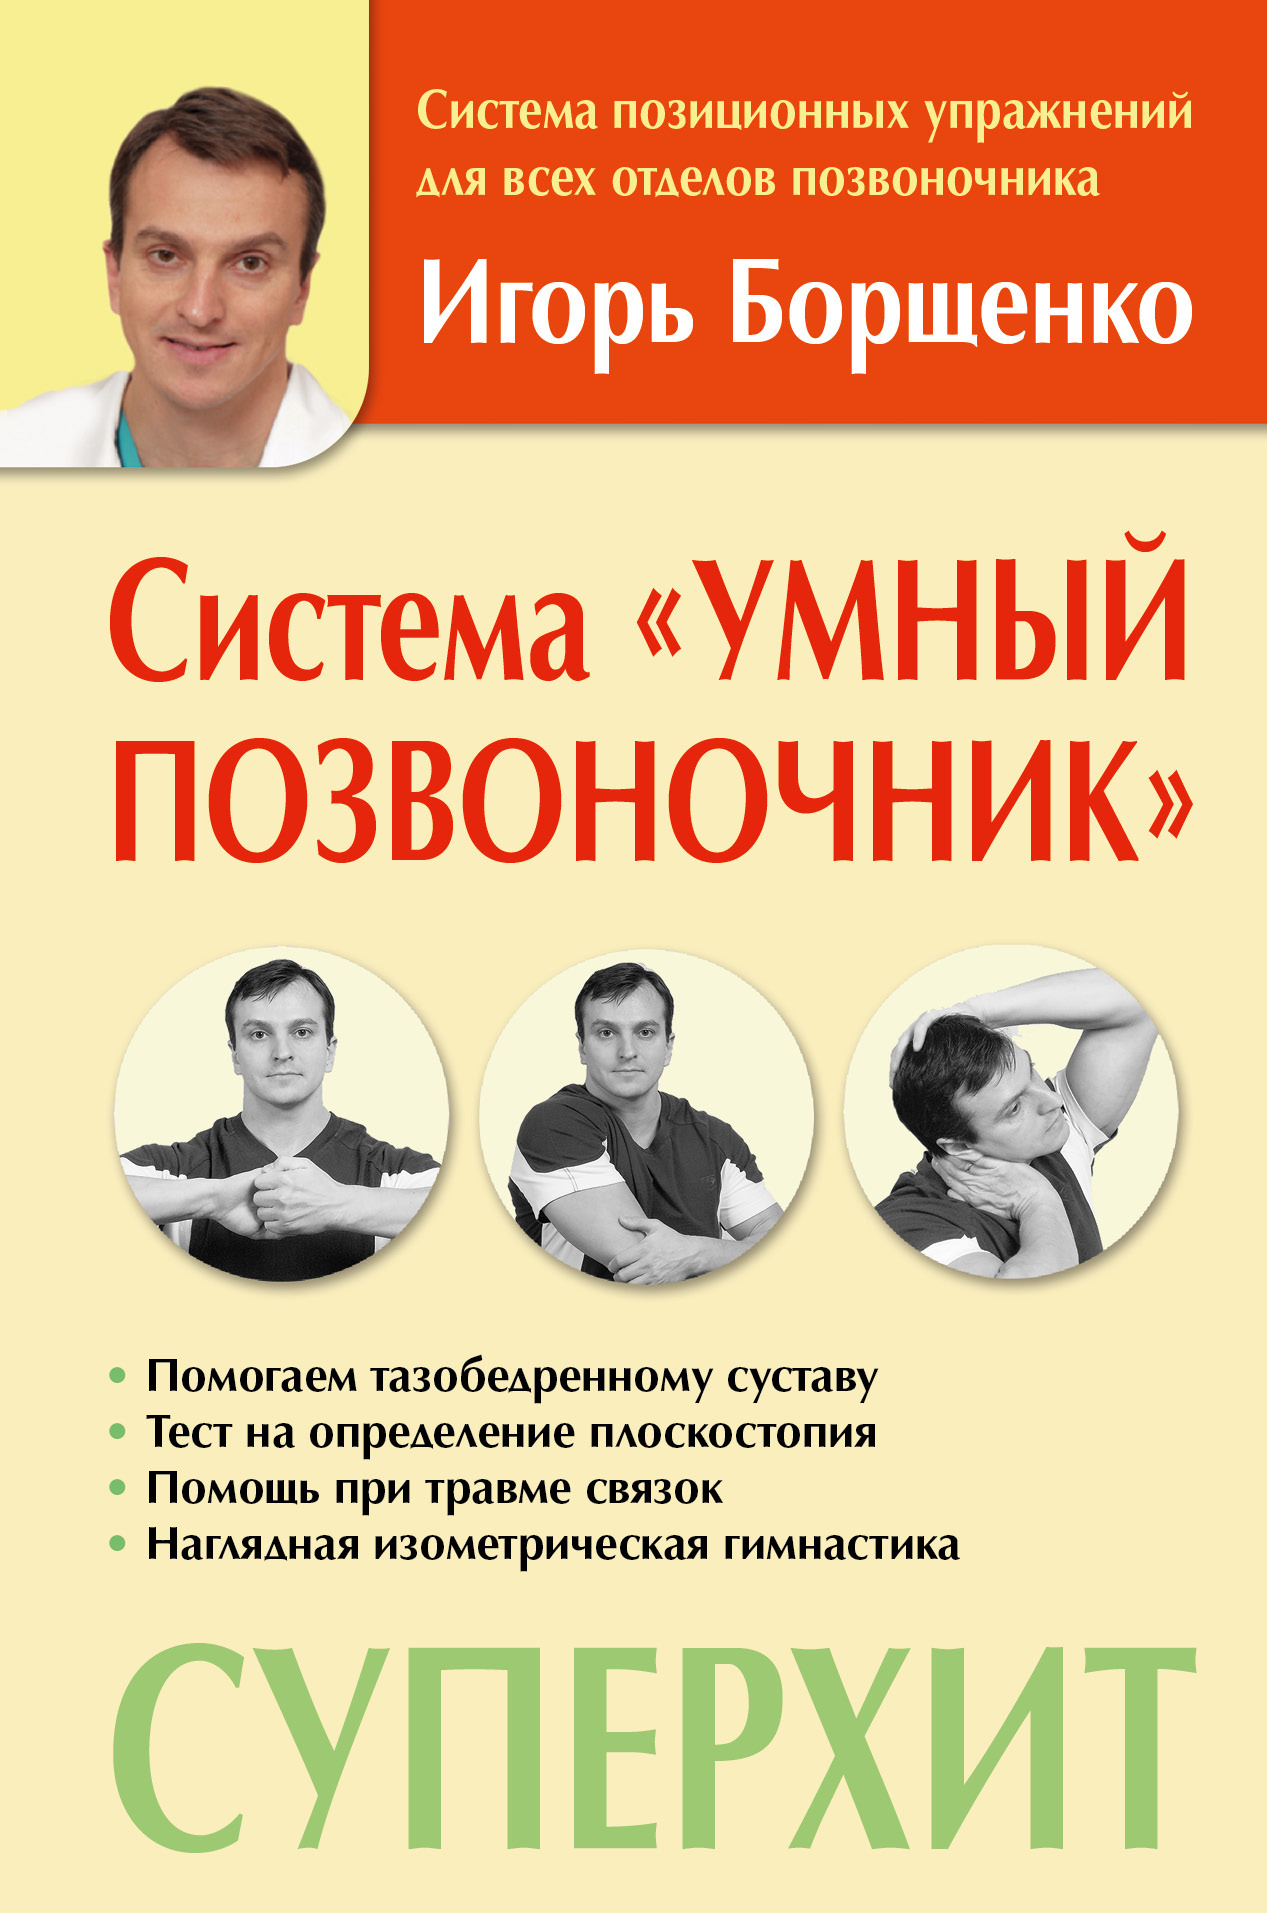 Борщенко И. А.. (2015)Система «Умный позвоночник» | Борщенко И. А.